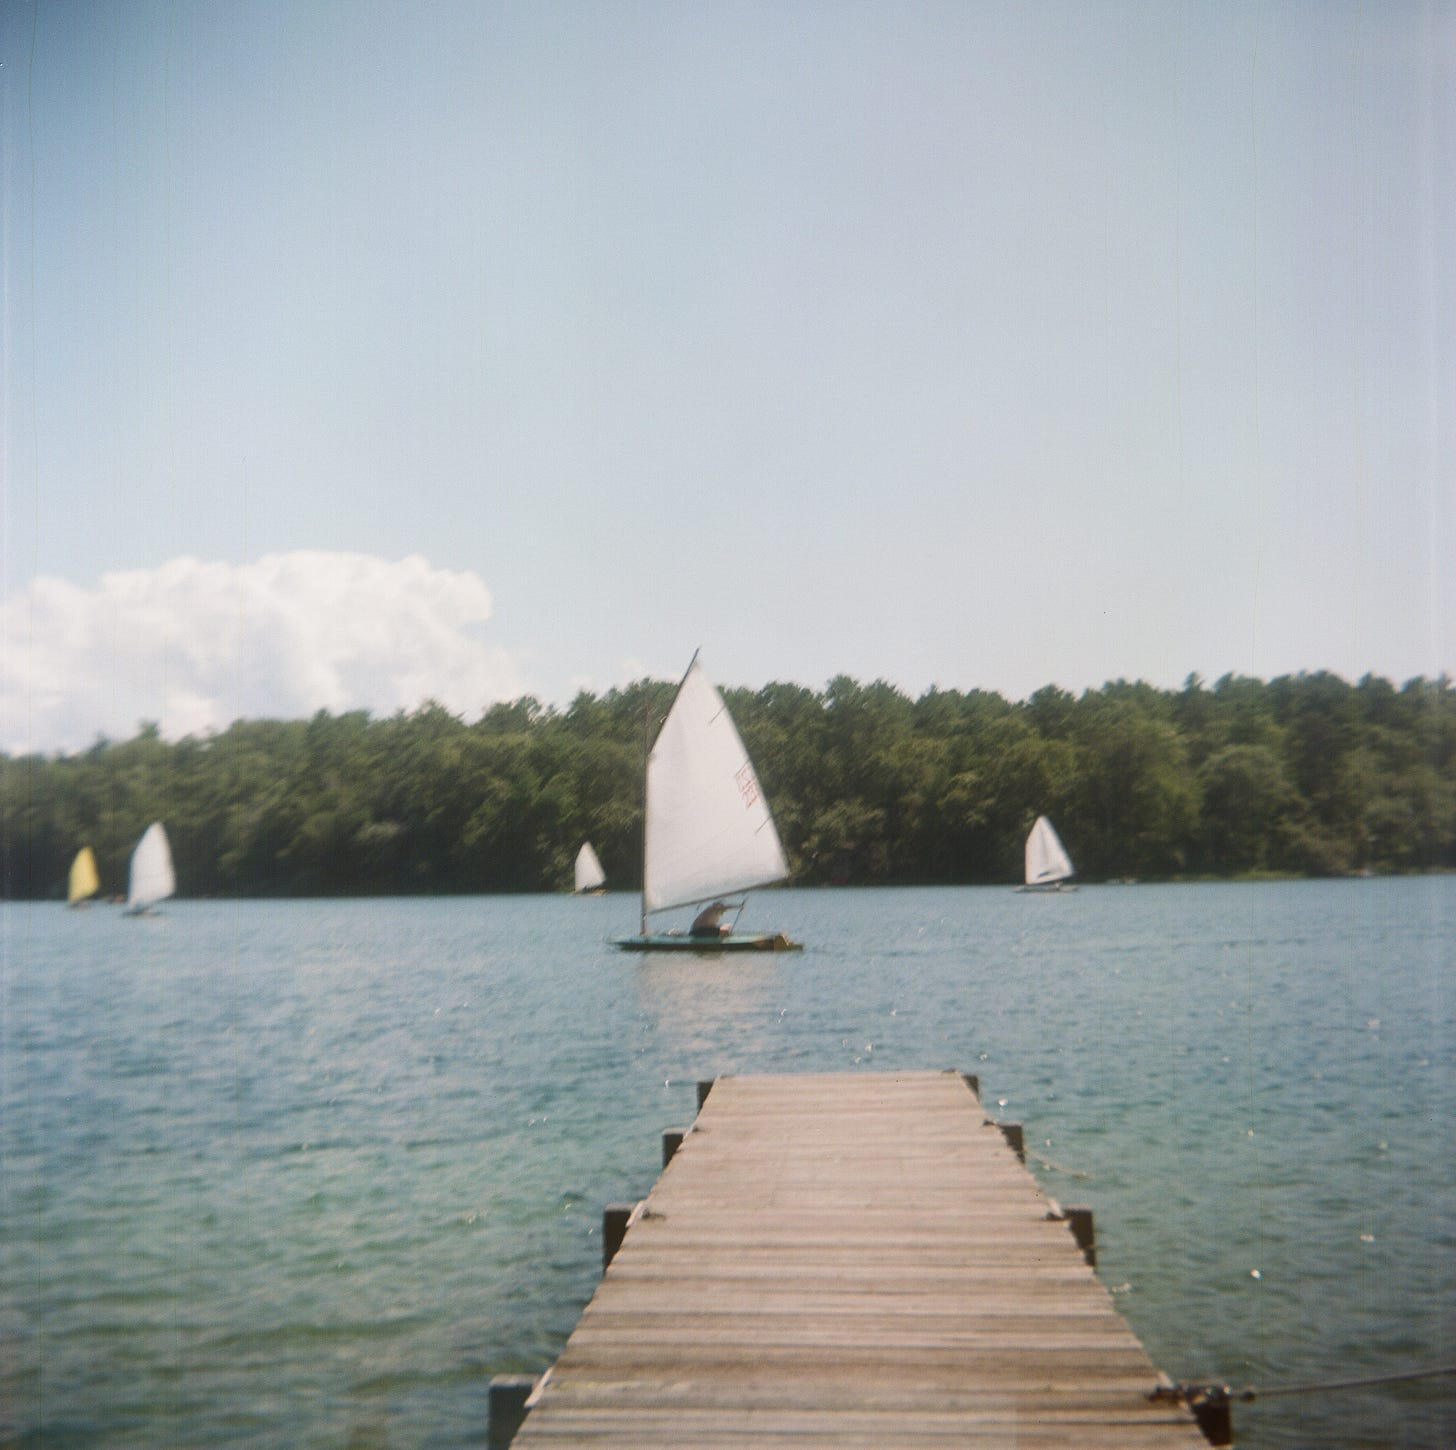 A sailboat on a pond